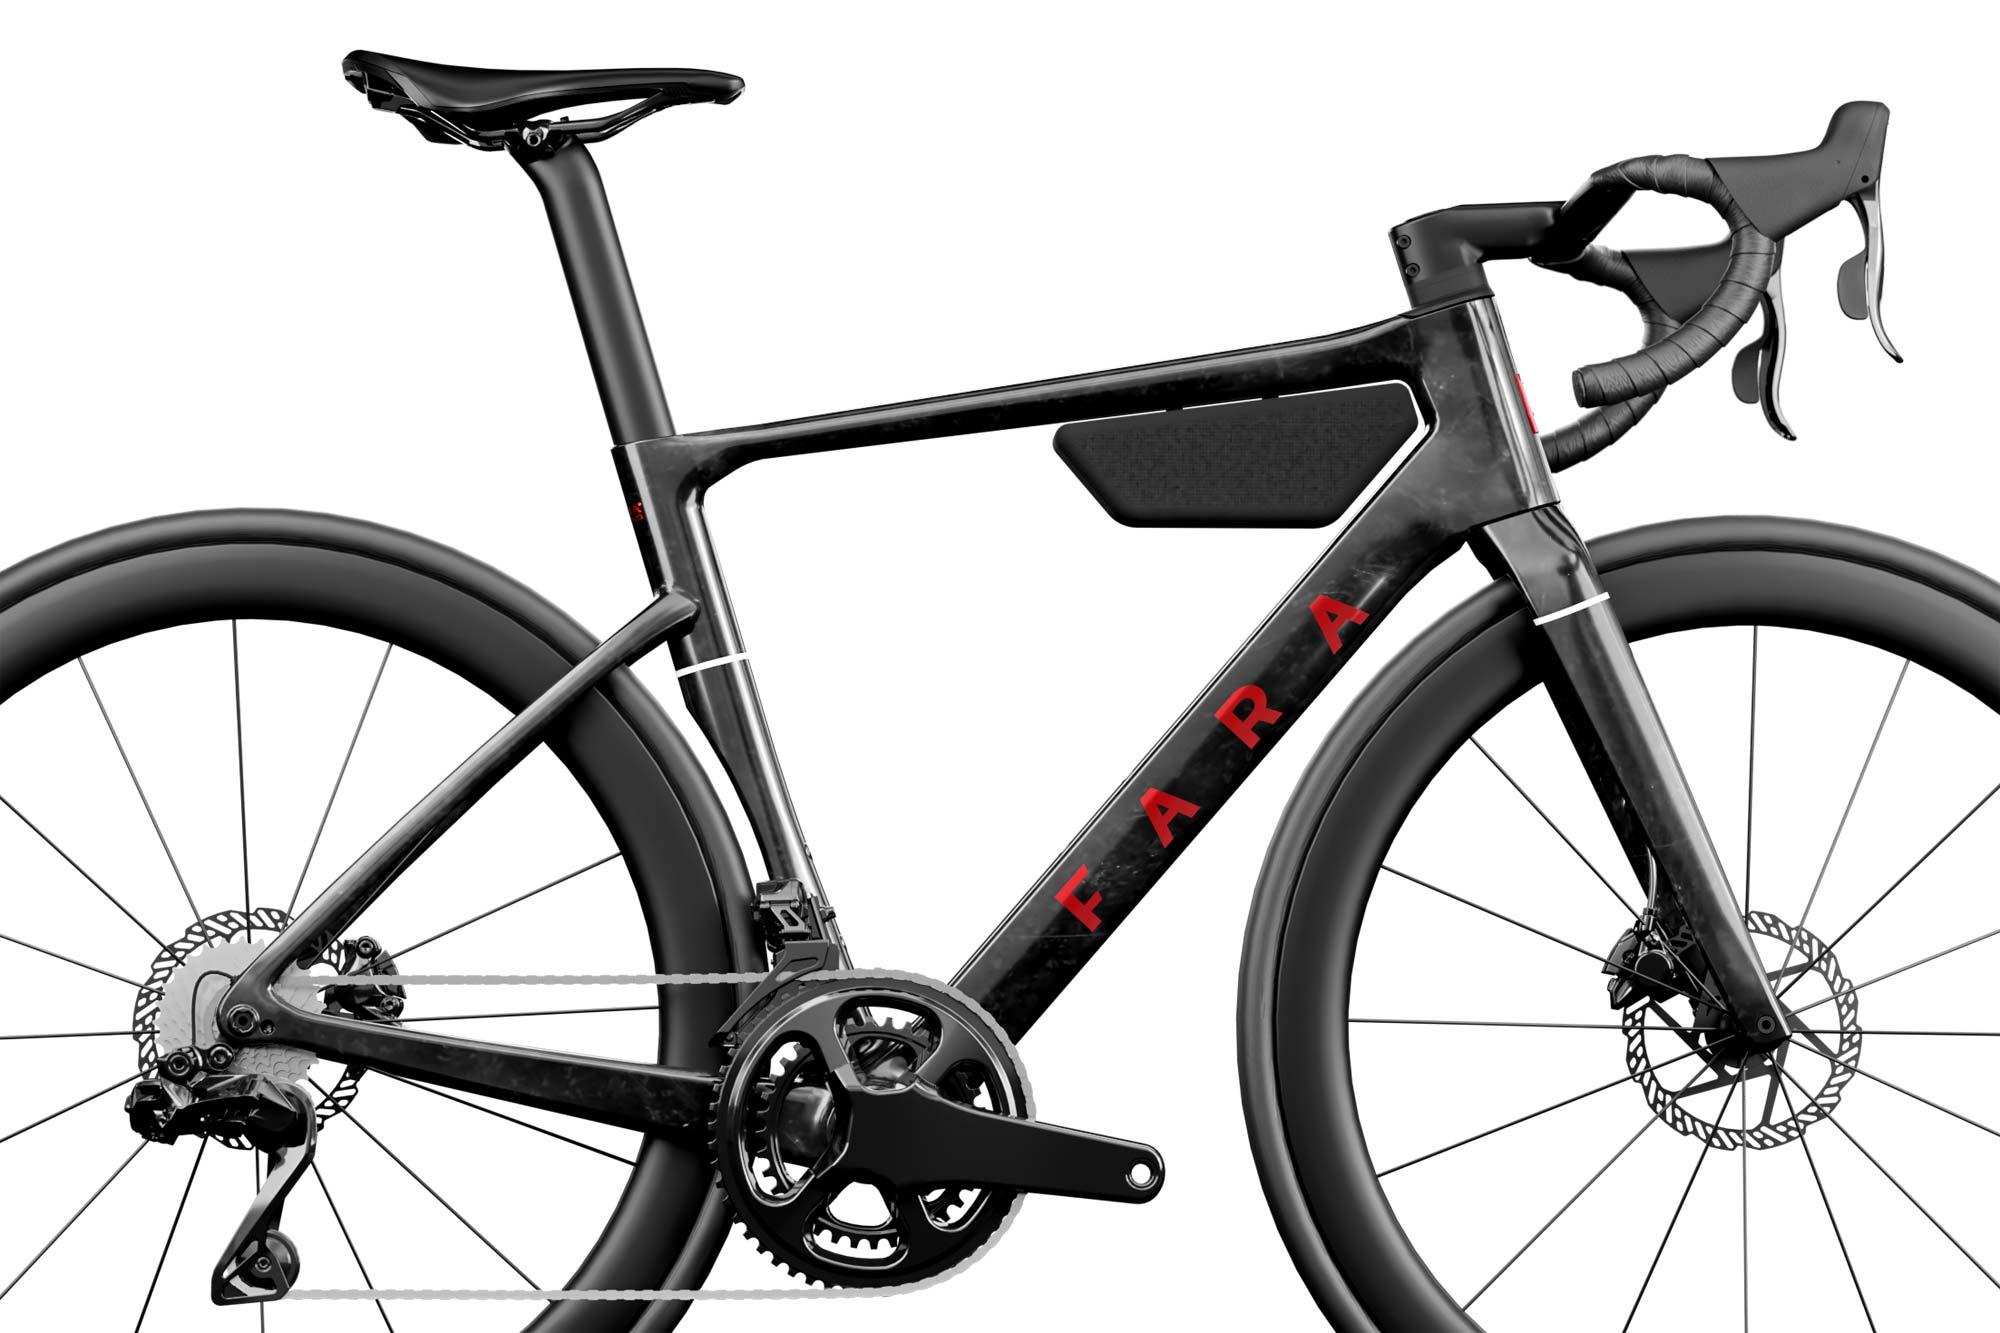 Fara F/RD aero carbon udholdenhed all-road cykel, zoom